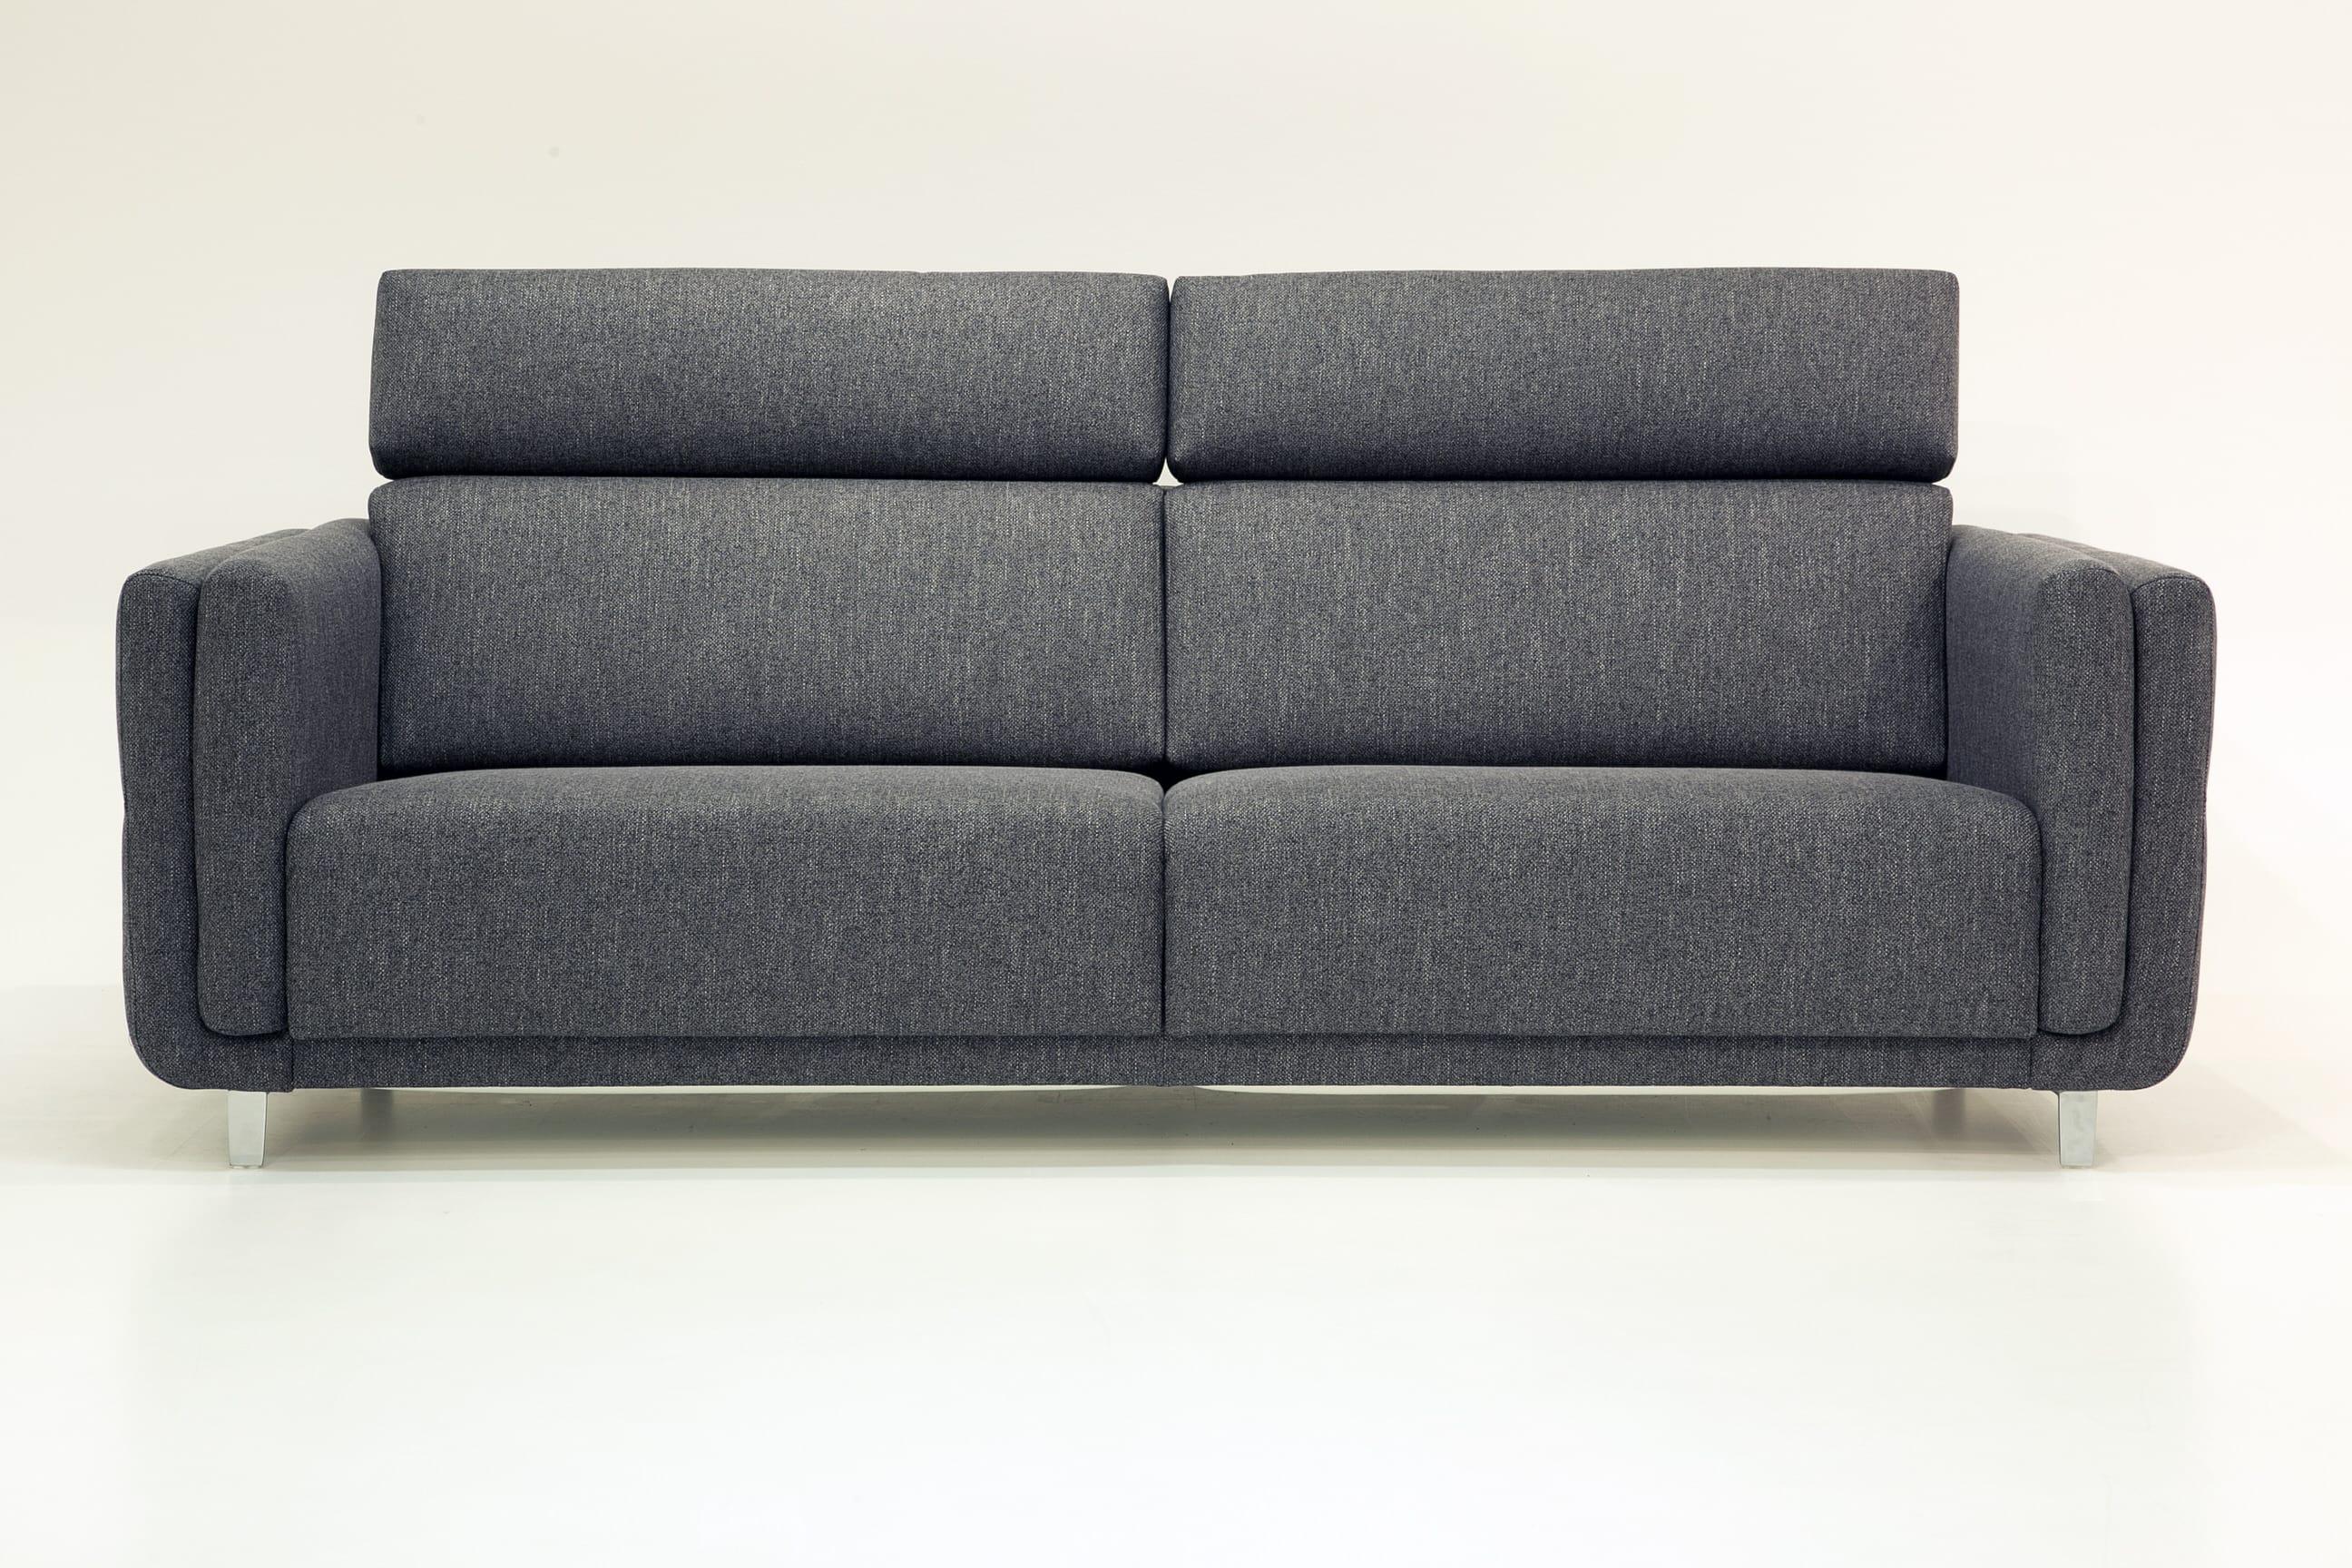 Paris Sofa Sleeper King Size By